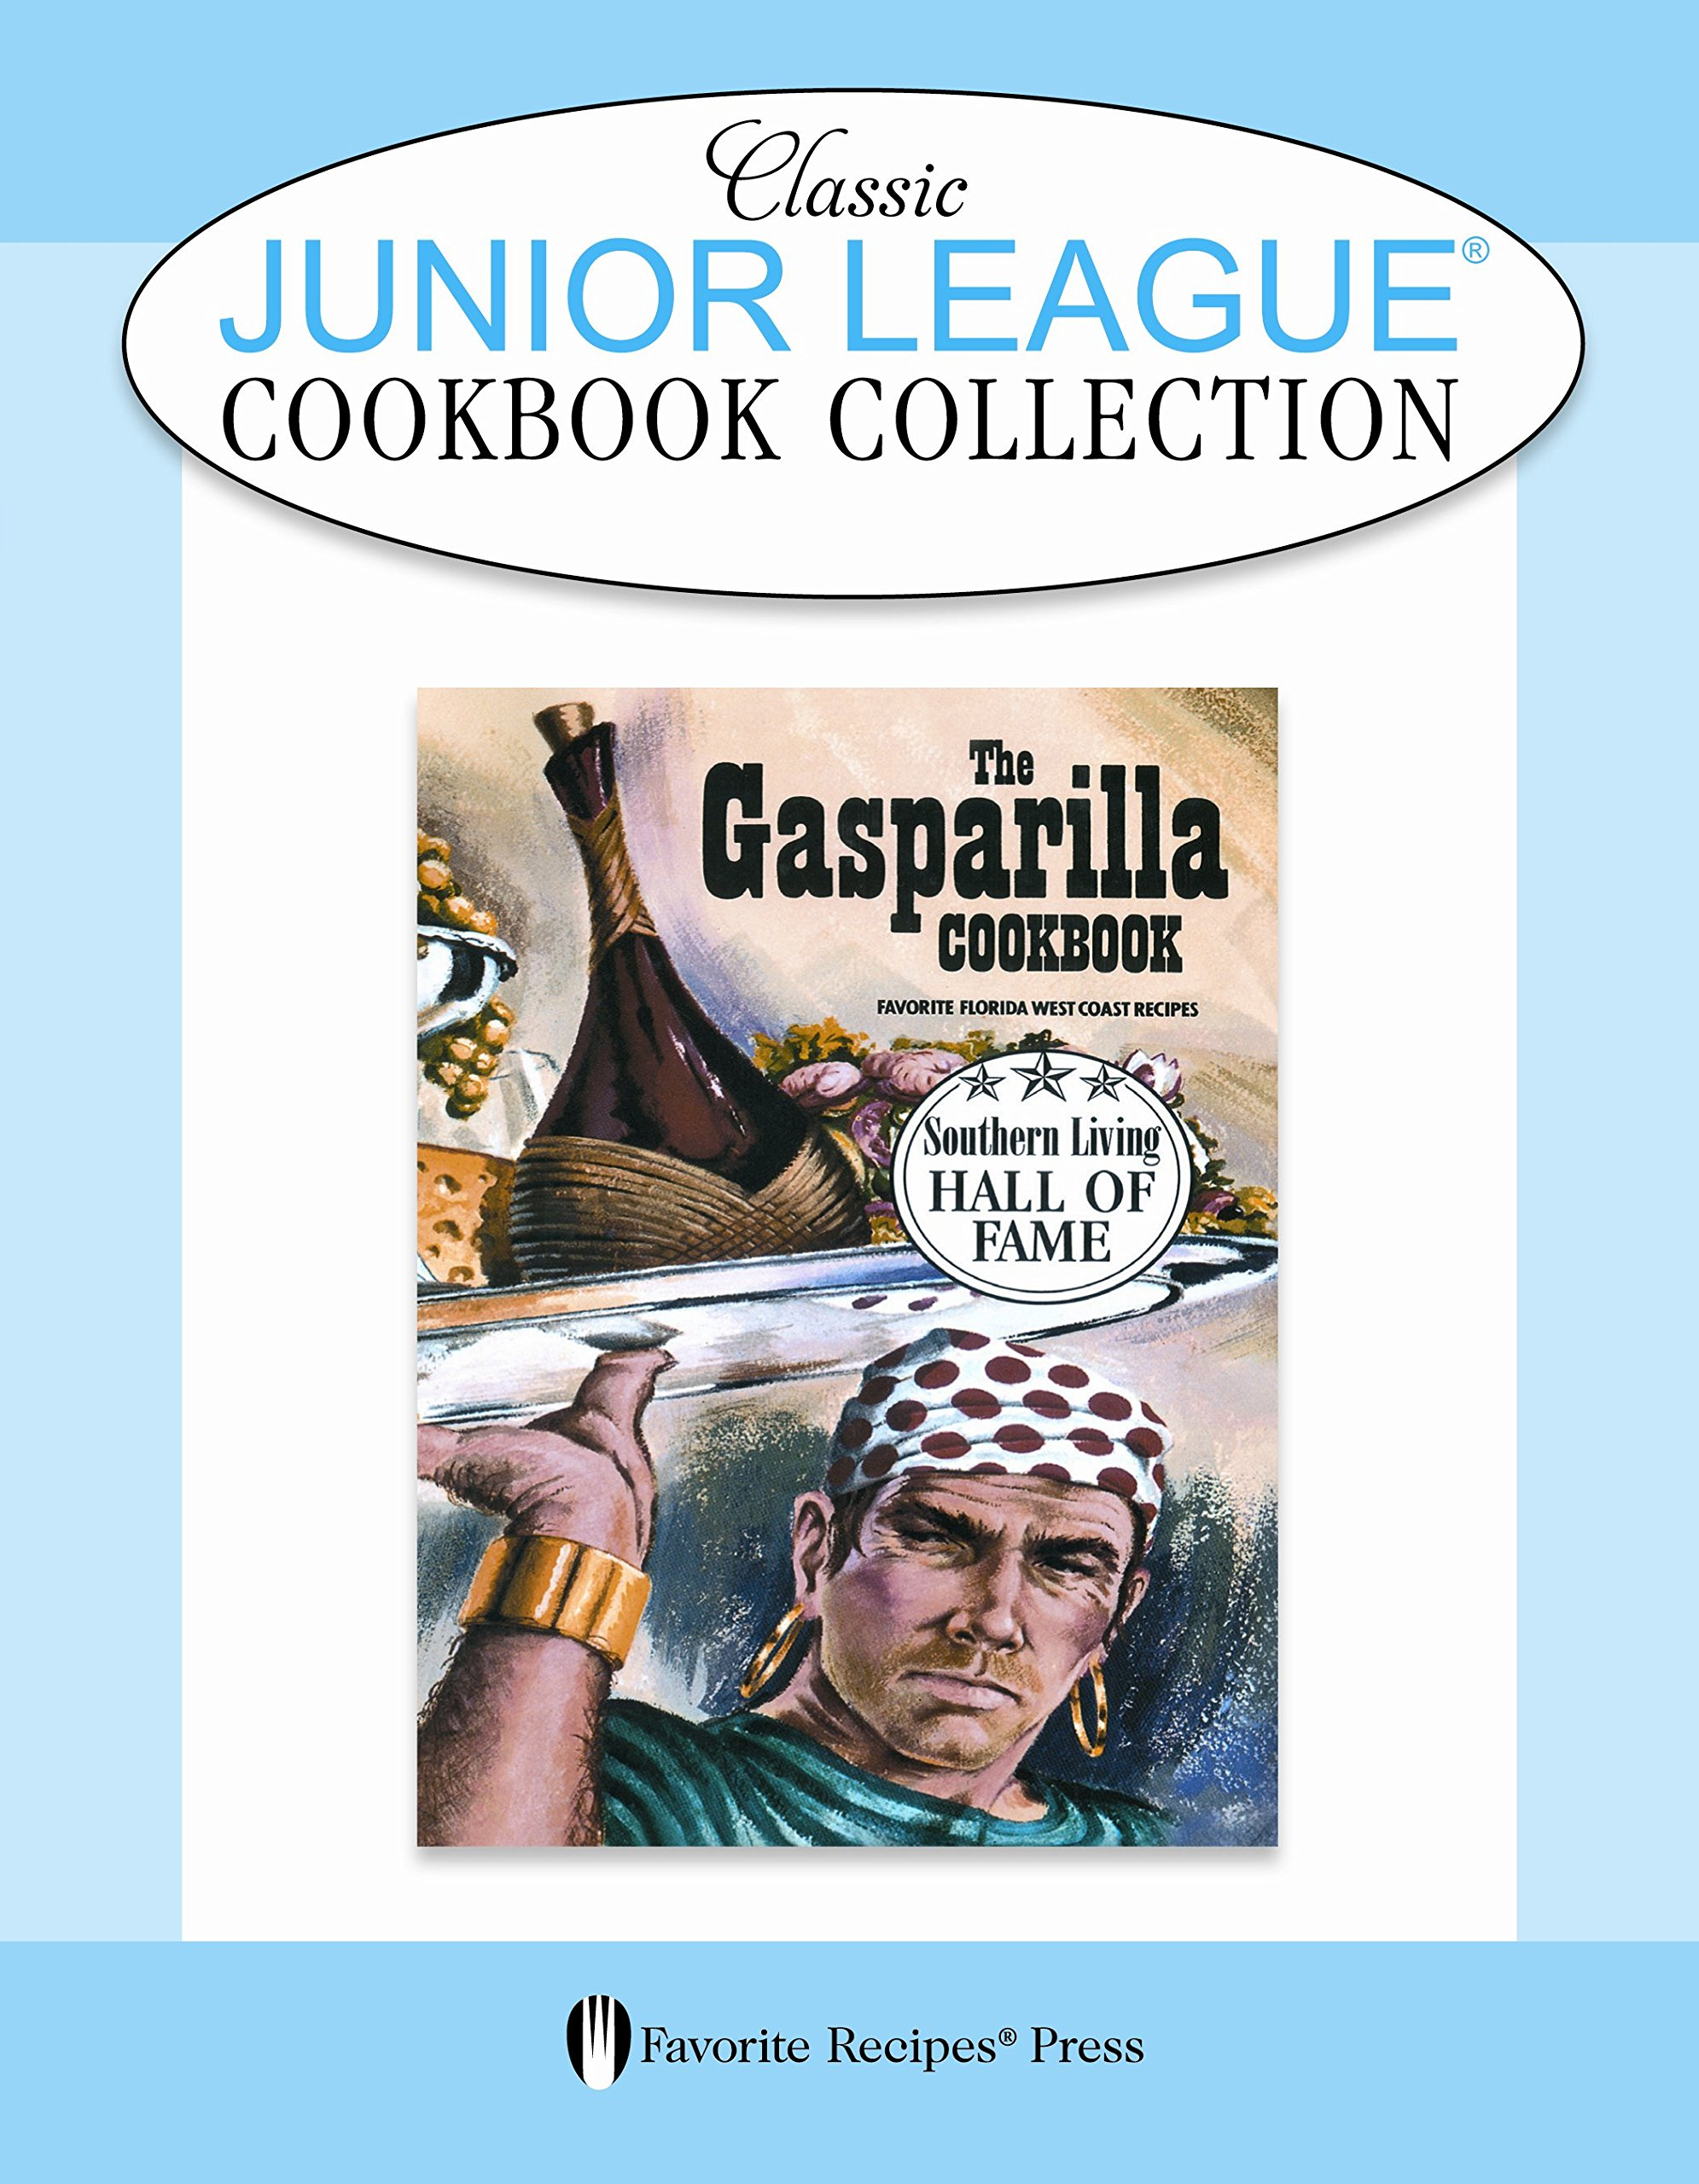 The Gasparilla Cookbook: Classic Junior League Cookbook ebook